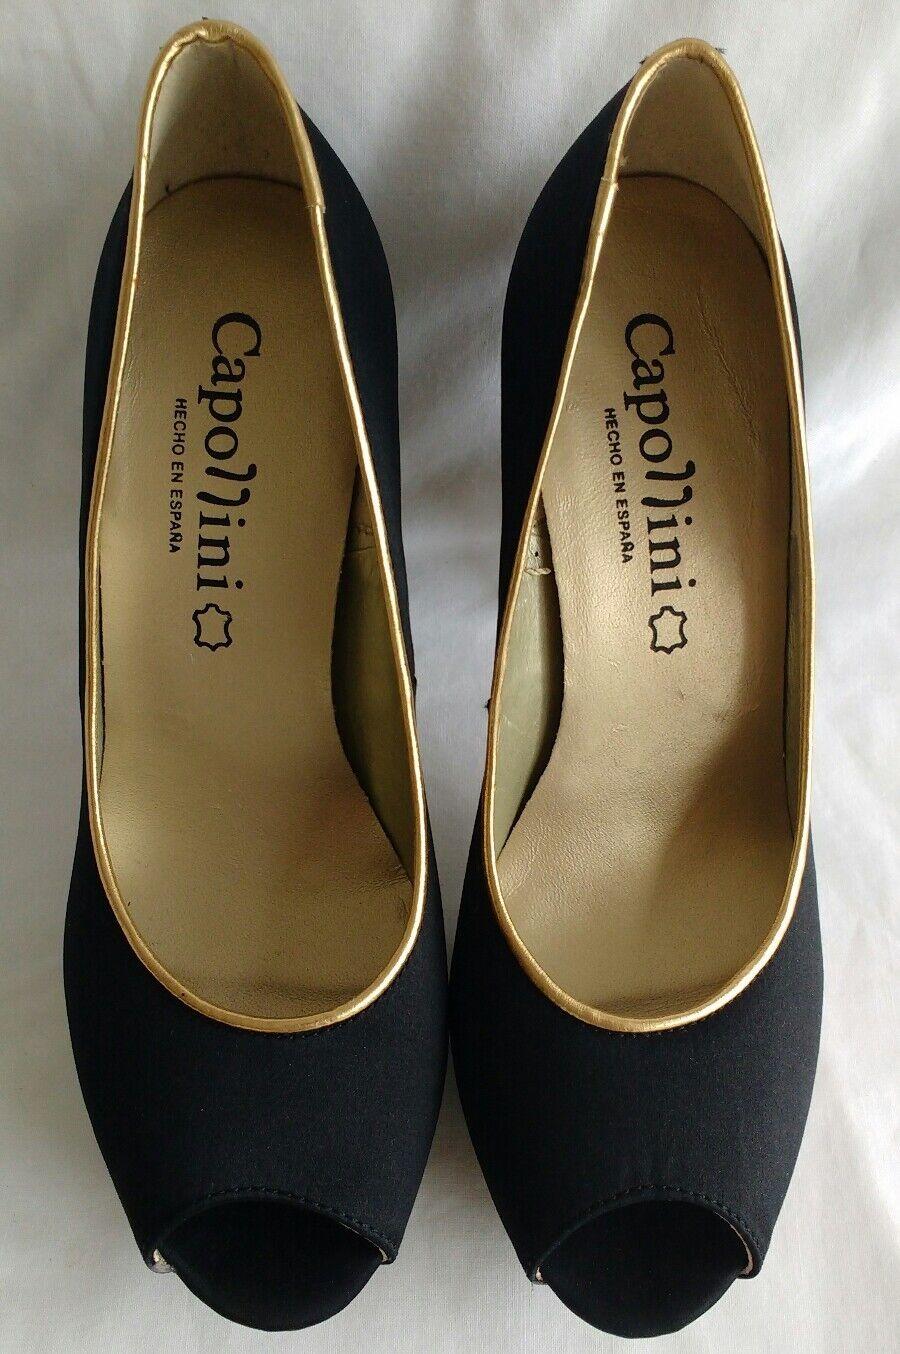 Womens Ladies Capollini Black Satin Gold Peep Toe Court Shoes Size 3/36 New